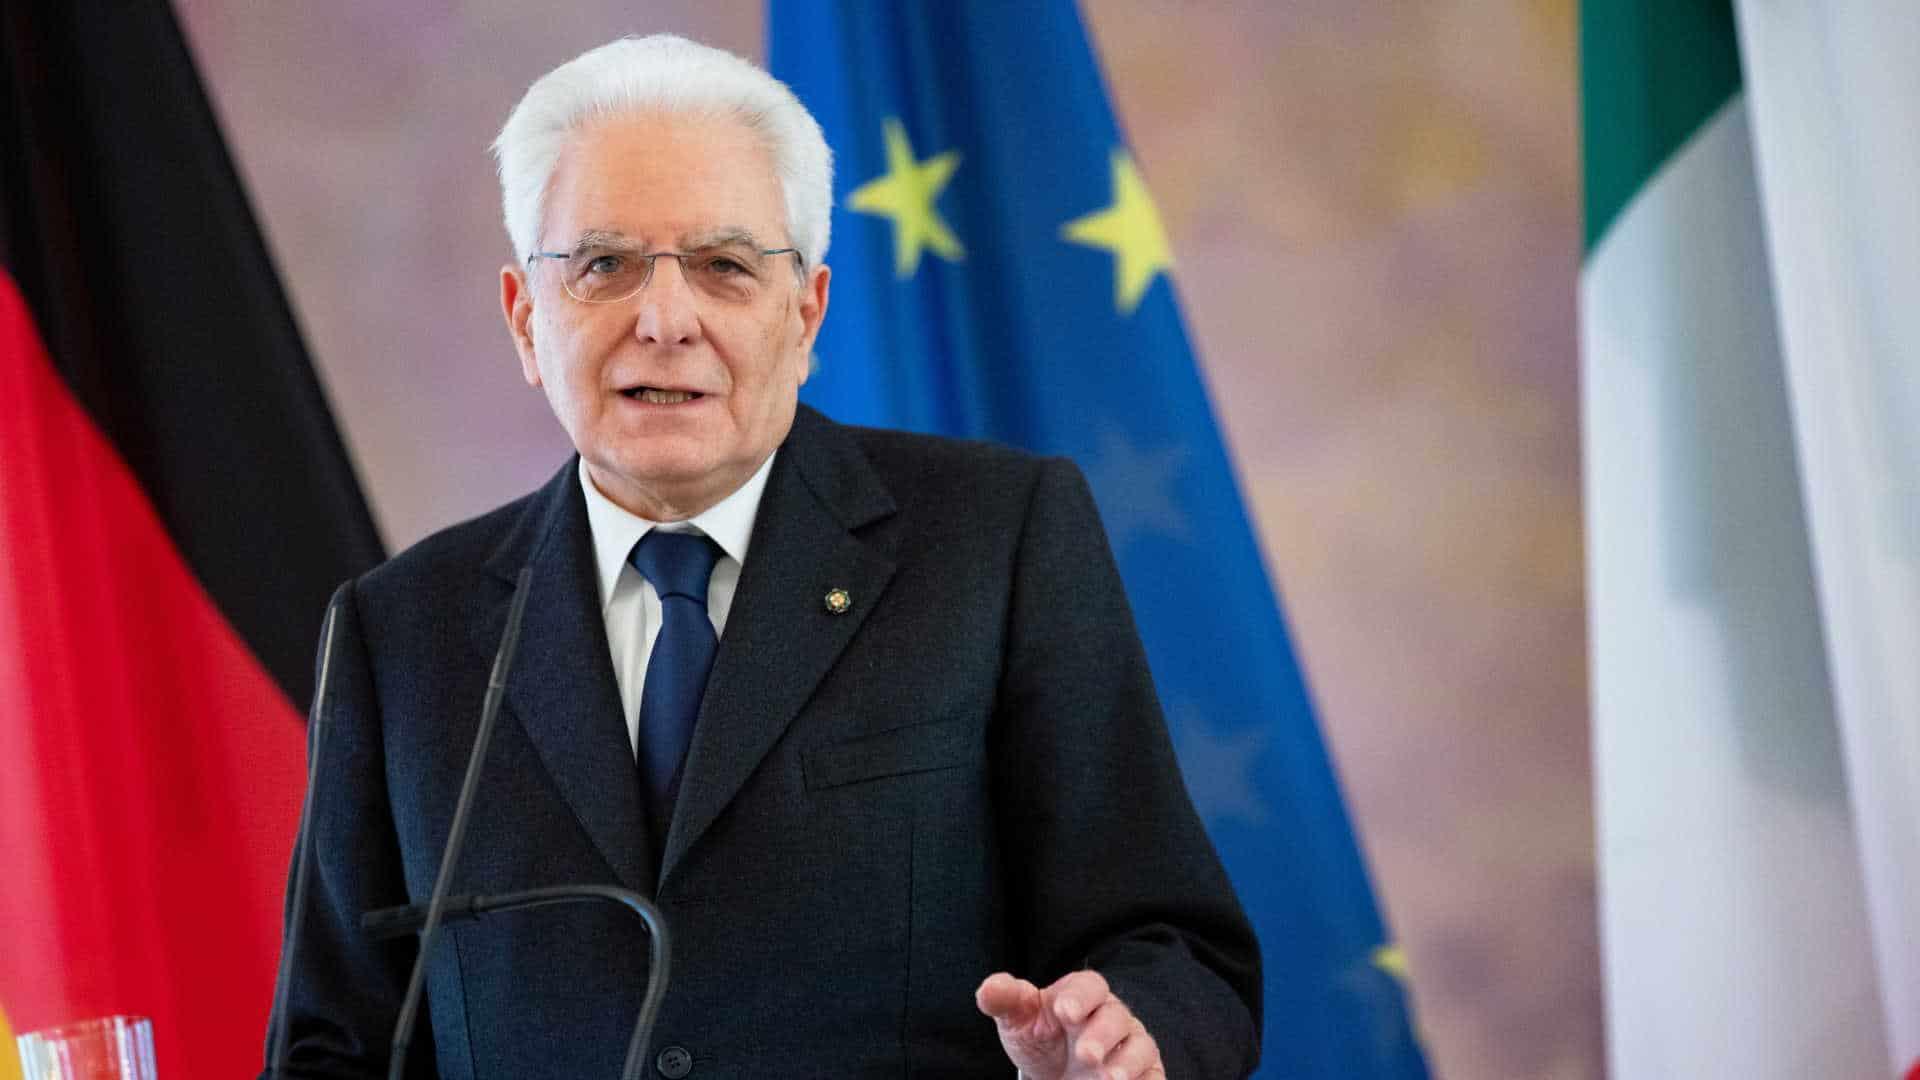 presidente italiano visita angola na próxima semana - Sergio Mattarella - Presidente Italiano visita Angola na próxima semana